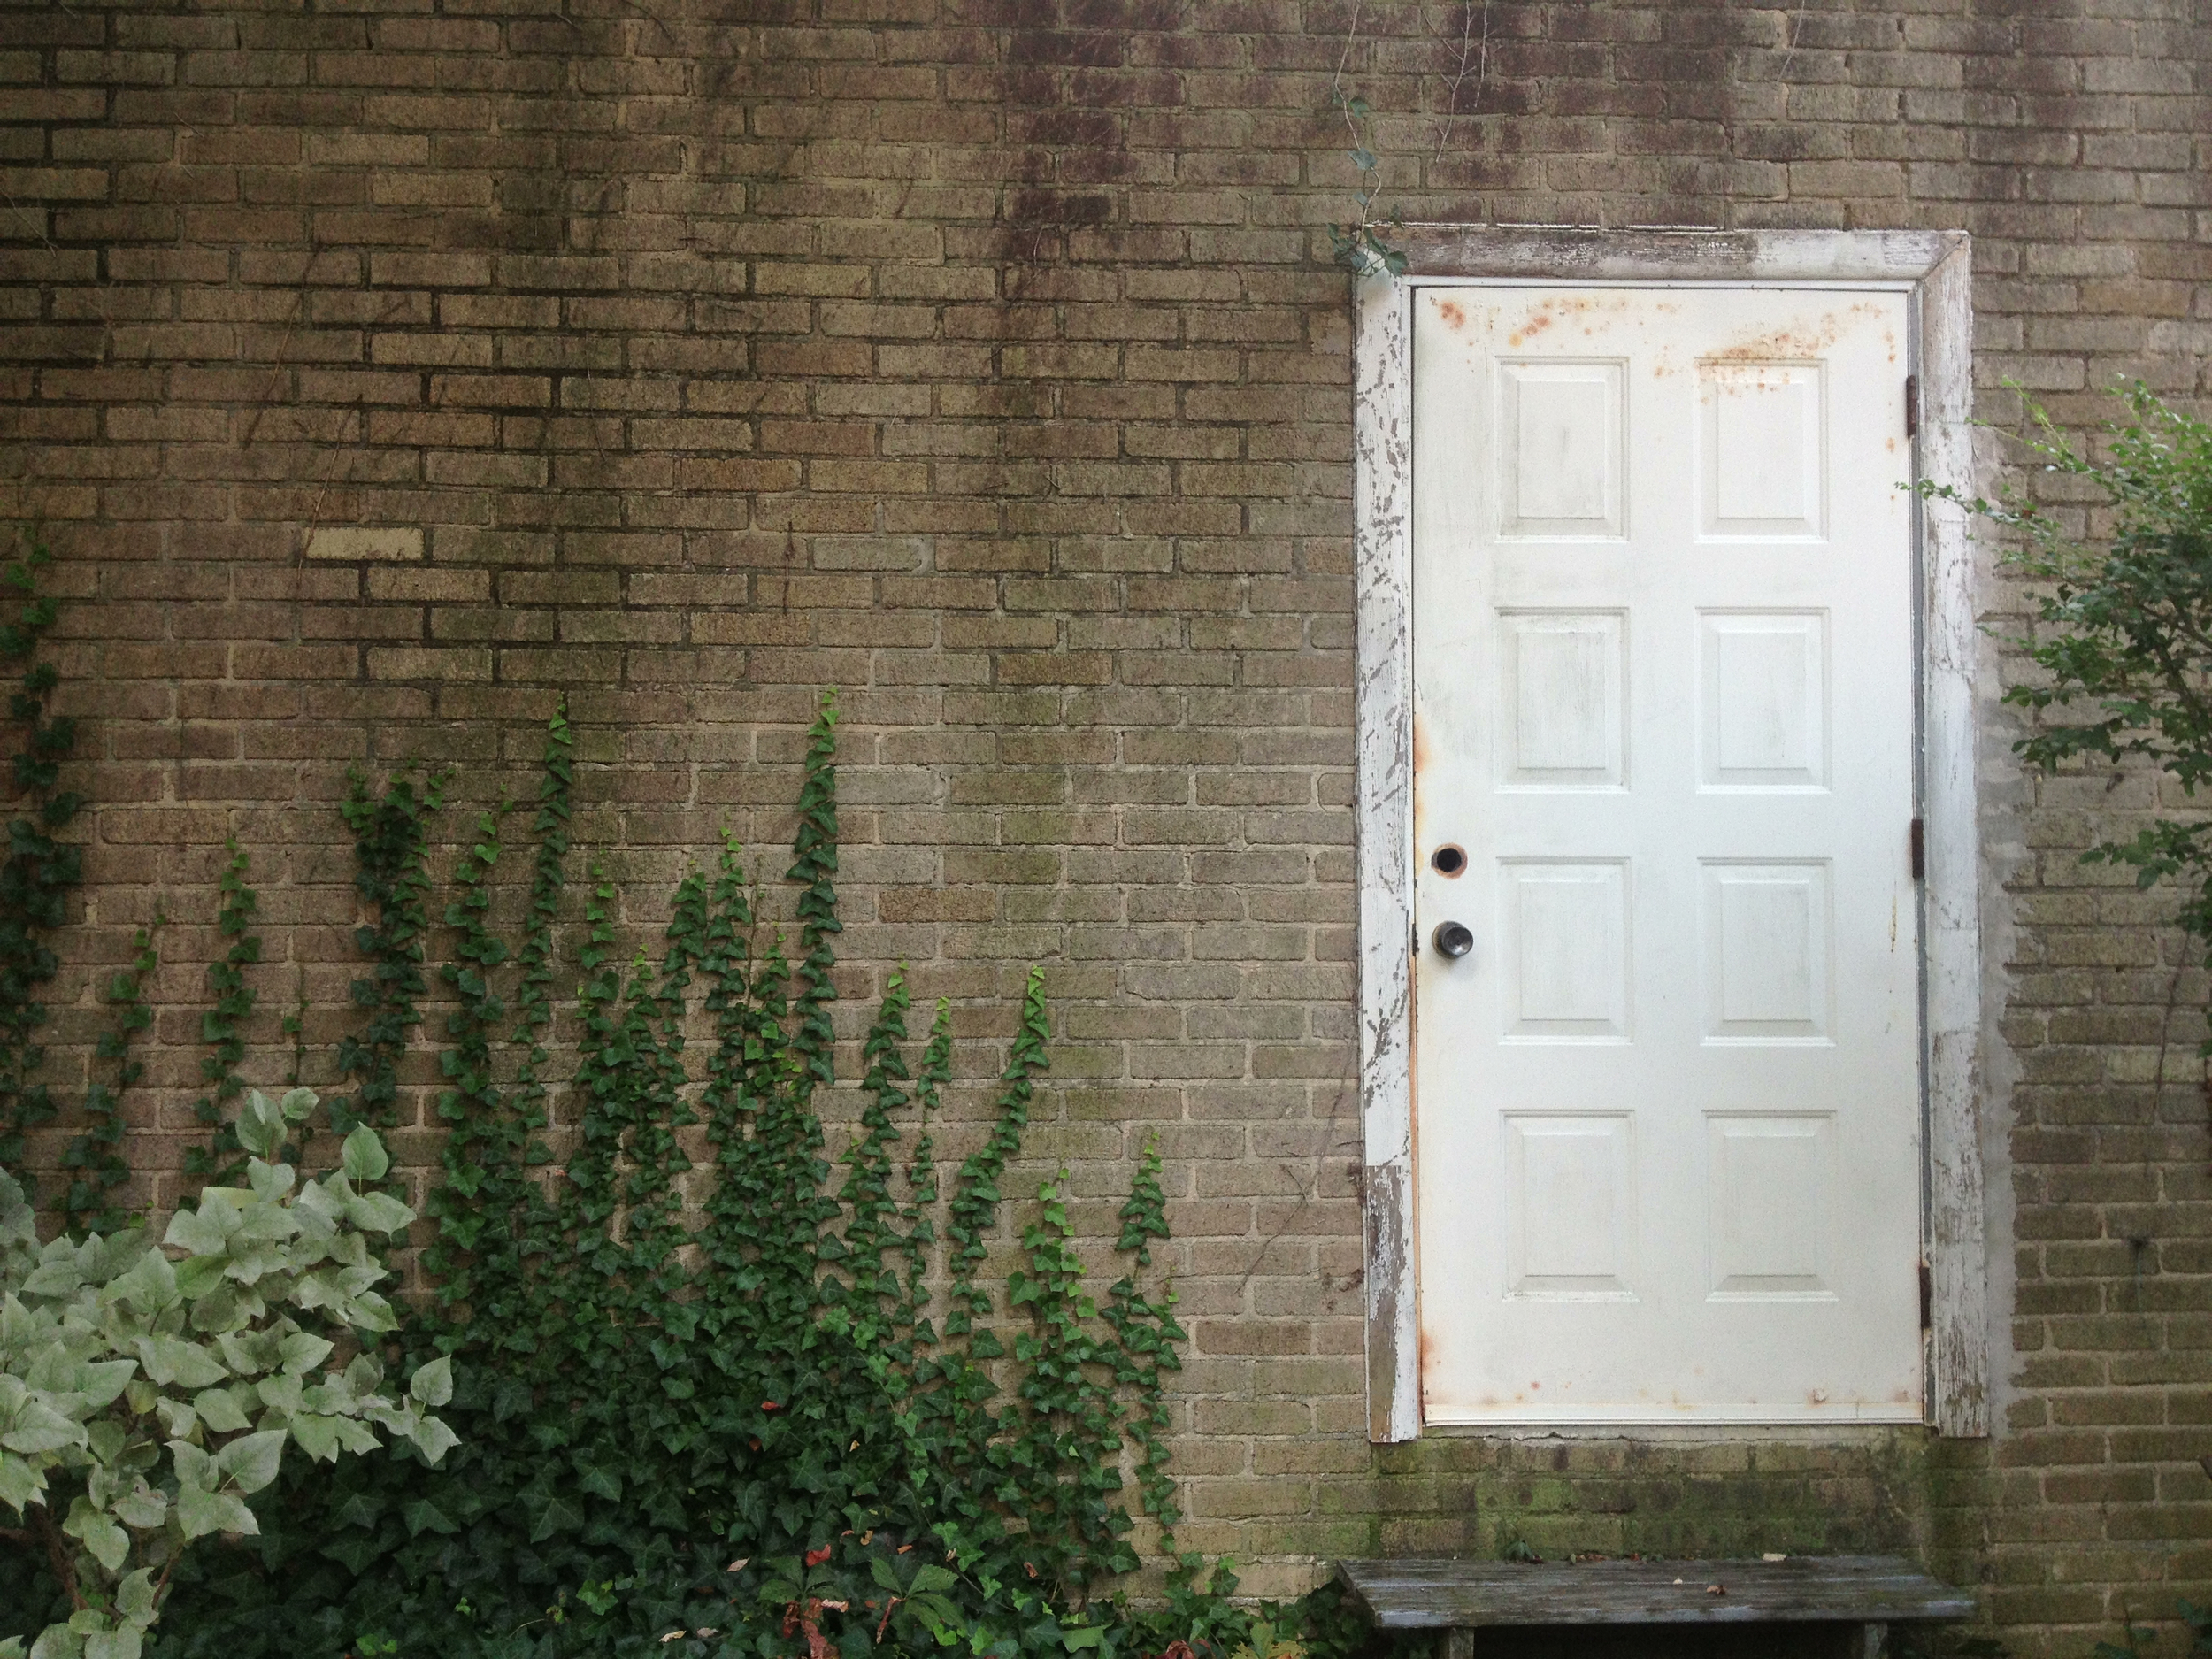 Still life with garage door and vines.